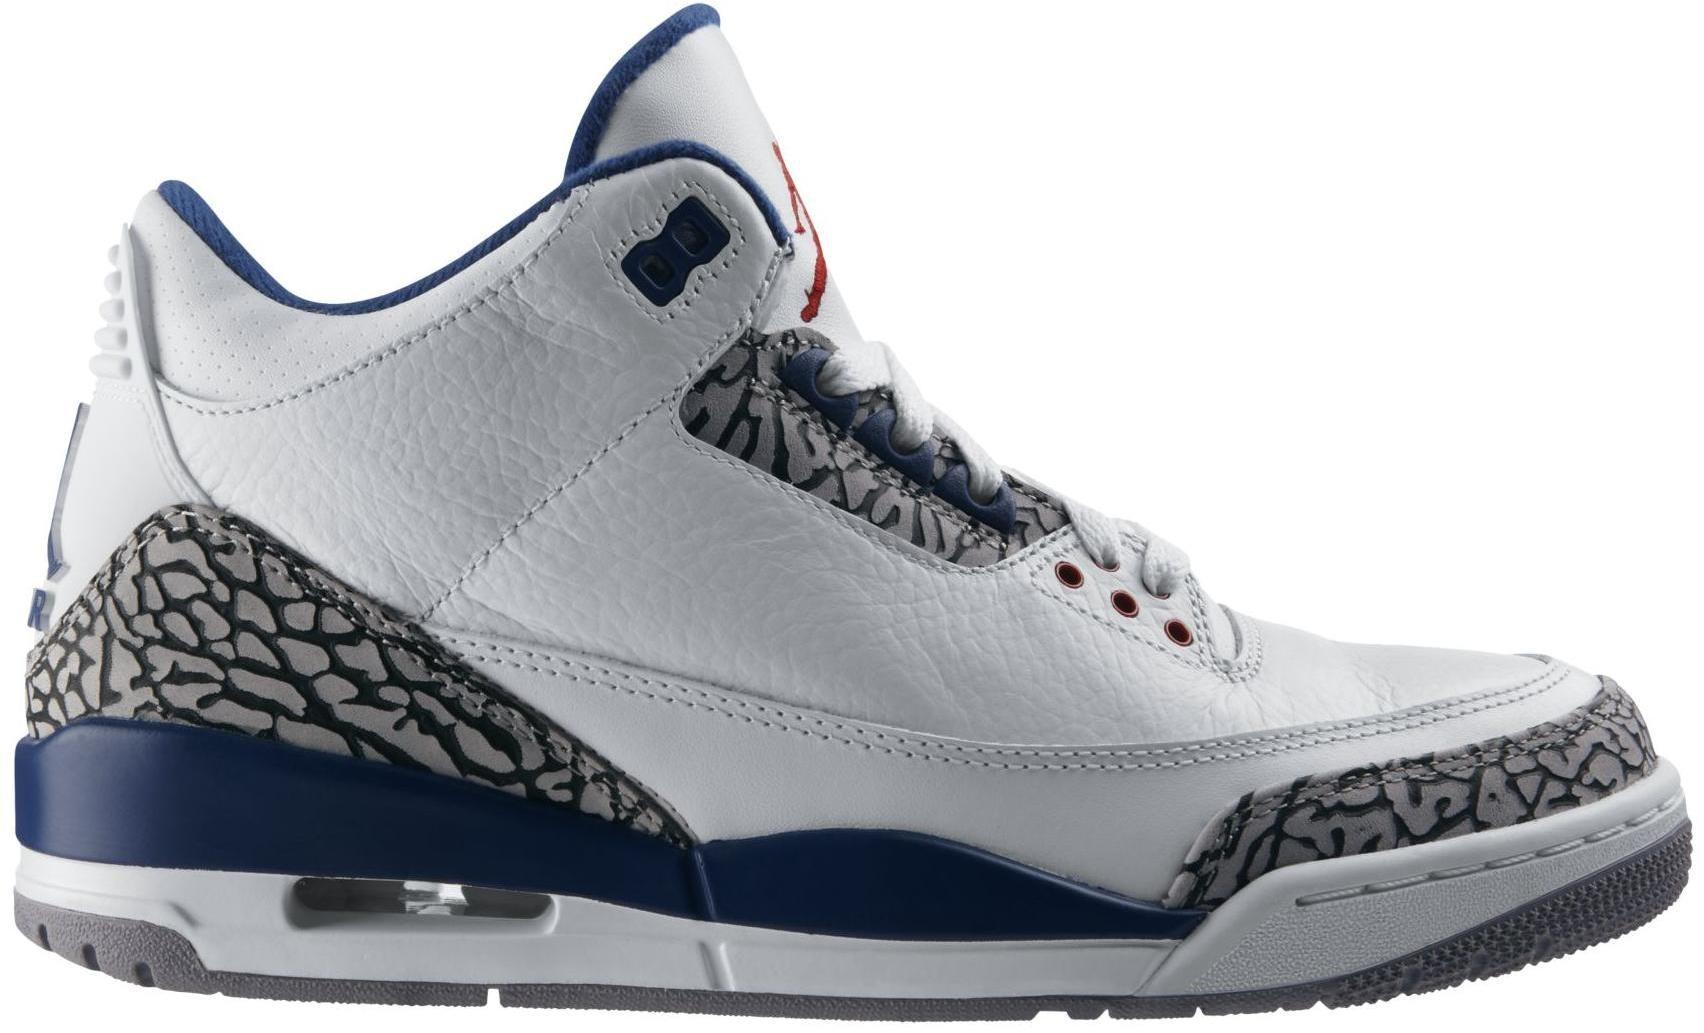 Jordan 3 Retro True Blue (2011)